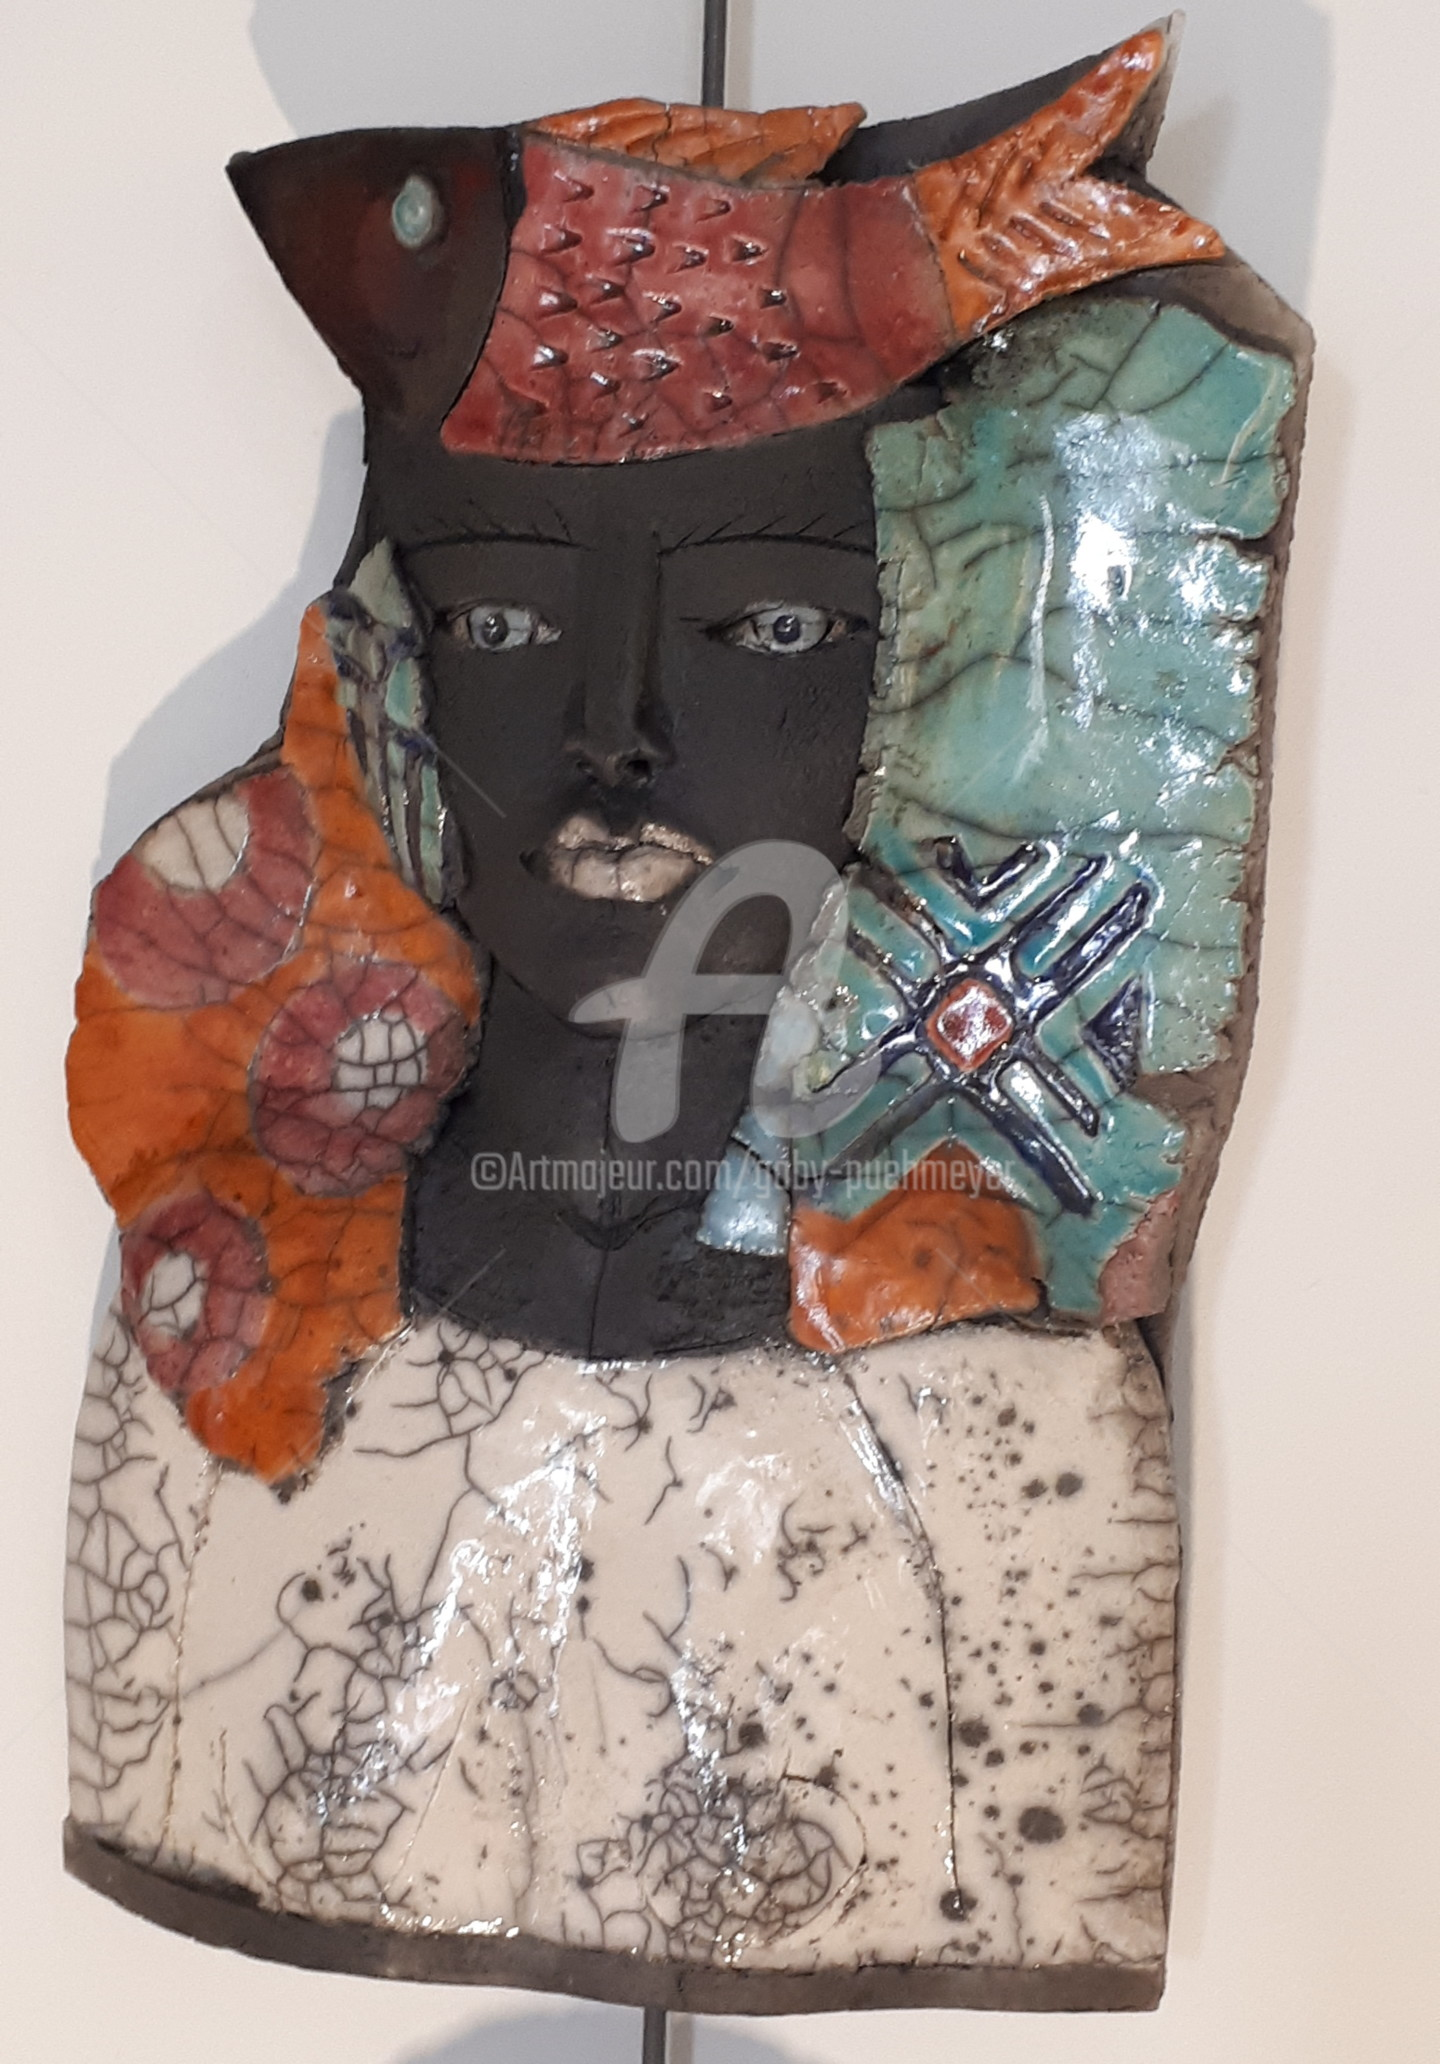 Gaby Pühmeyer - Travel Companion - Red Fish on Head